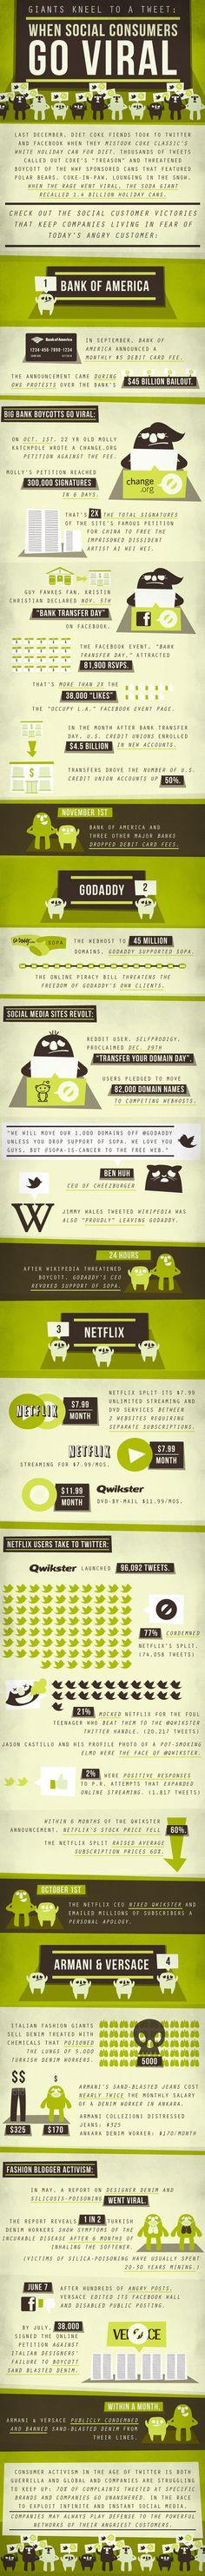 When social protests go viral #socialmedia #infographic (LOVE THE DIET COKE SLAM, BECAUSE I FELL FOR IT :[ )